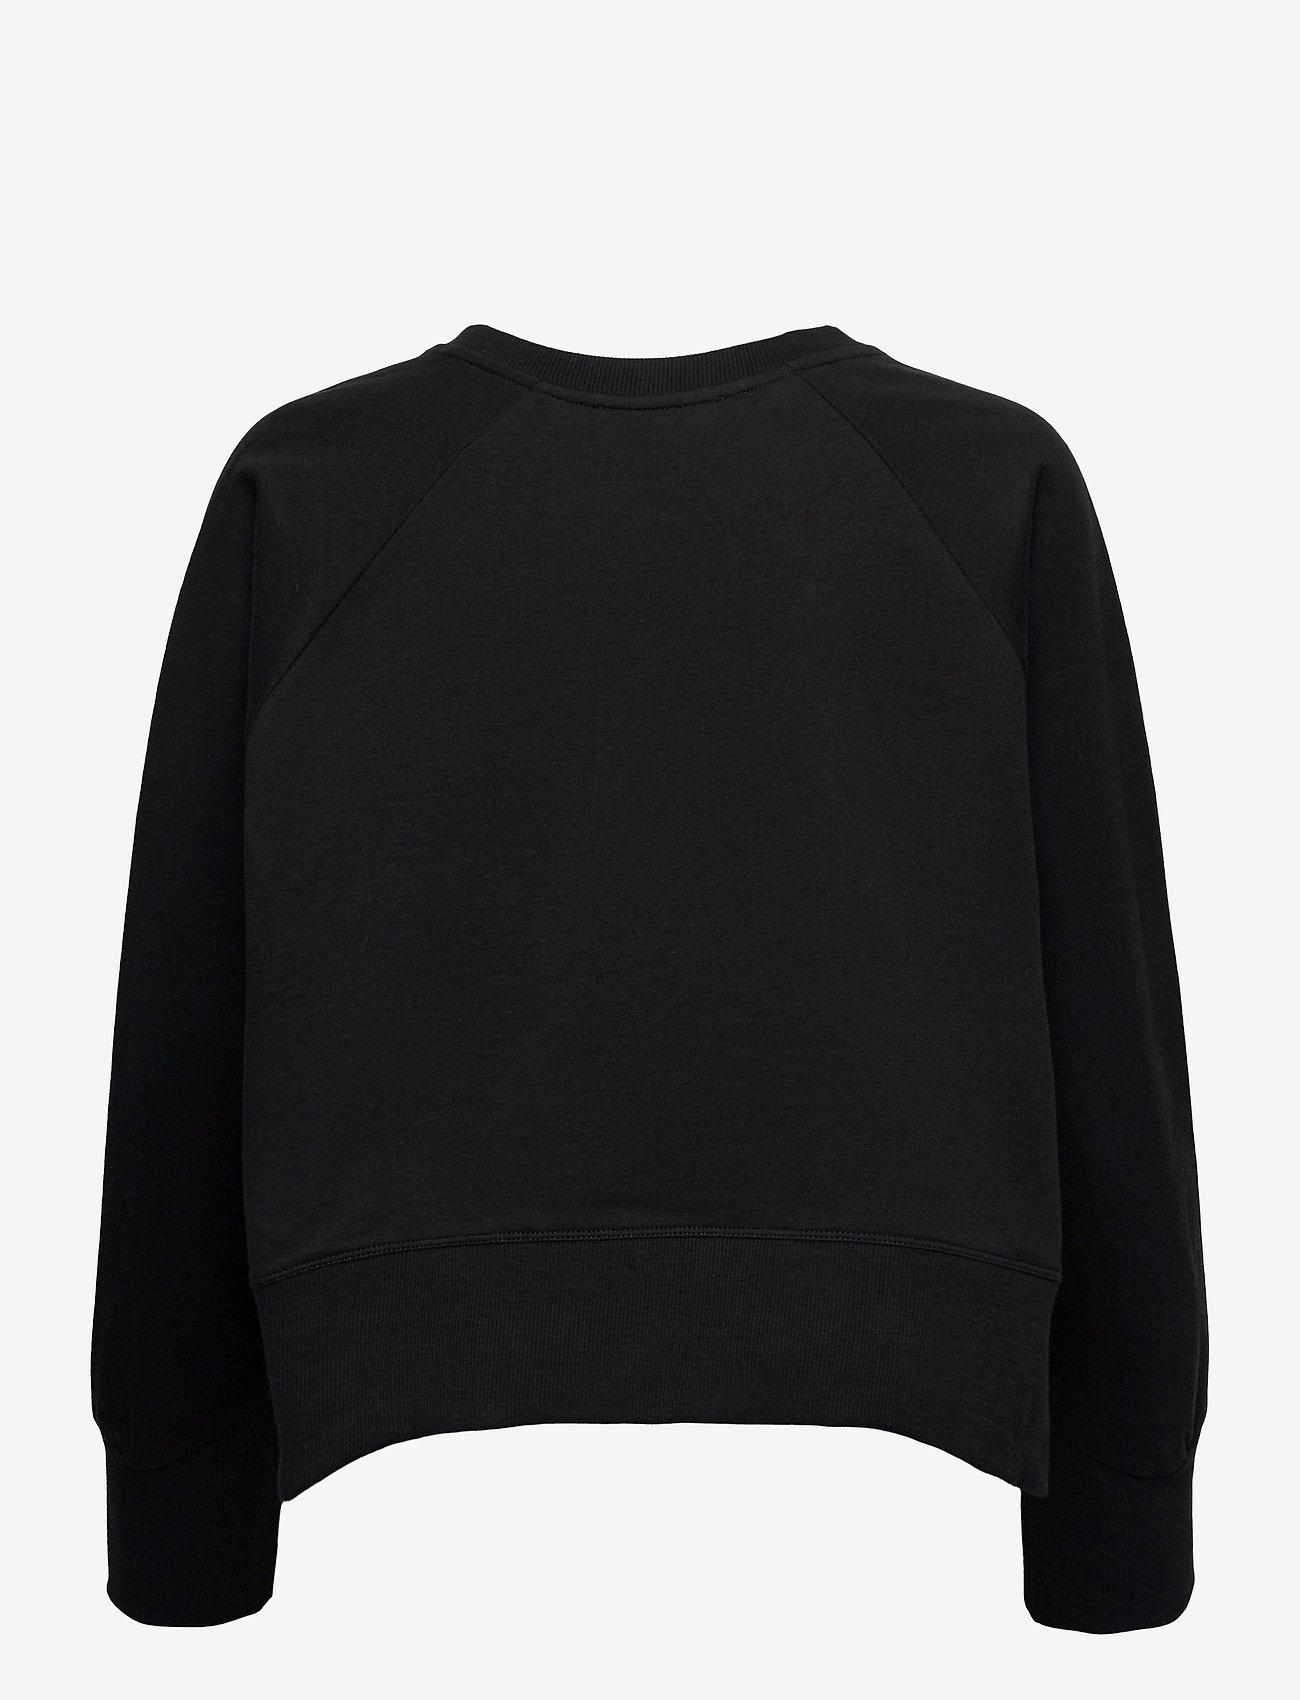 By Malina - Iconic cropped sweatshirt - sweatshirts & hoodies - black - 2